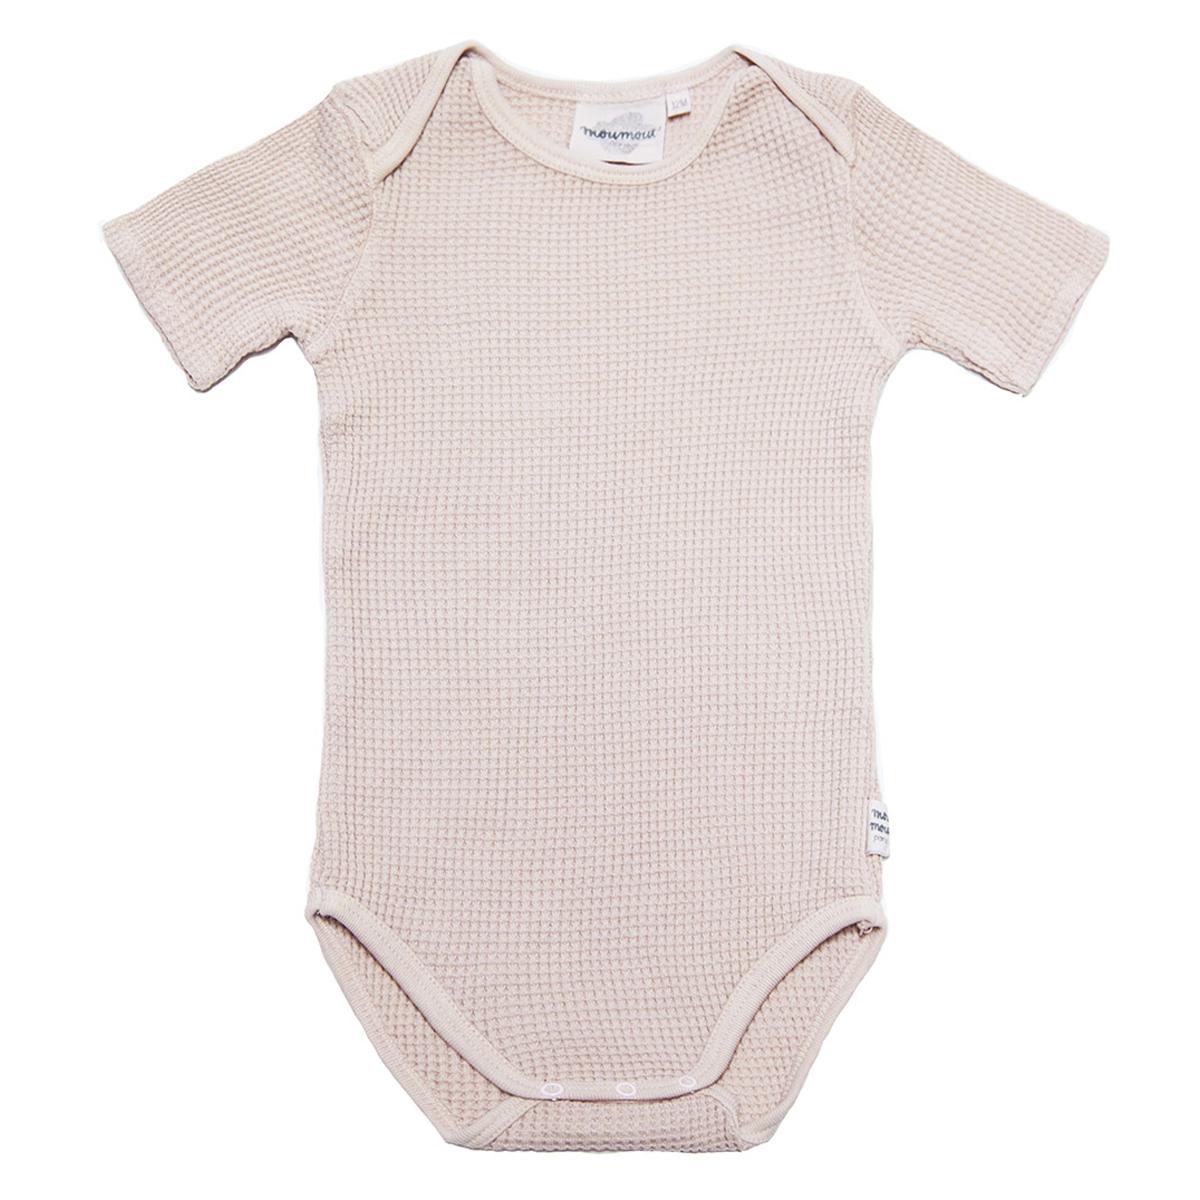 Body & Pyjama Body Raymond Bee Nude - 12 Mois